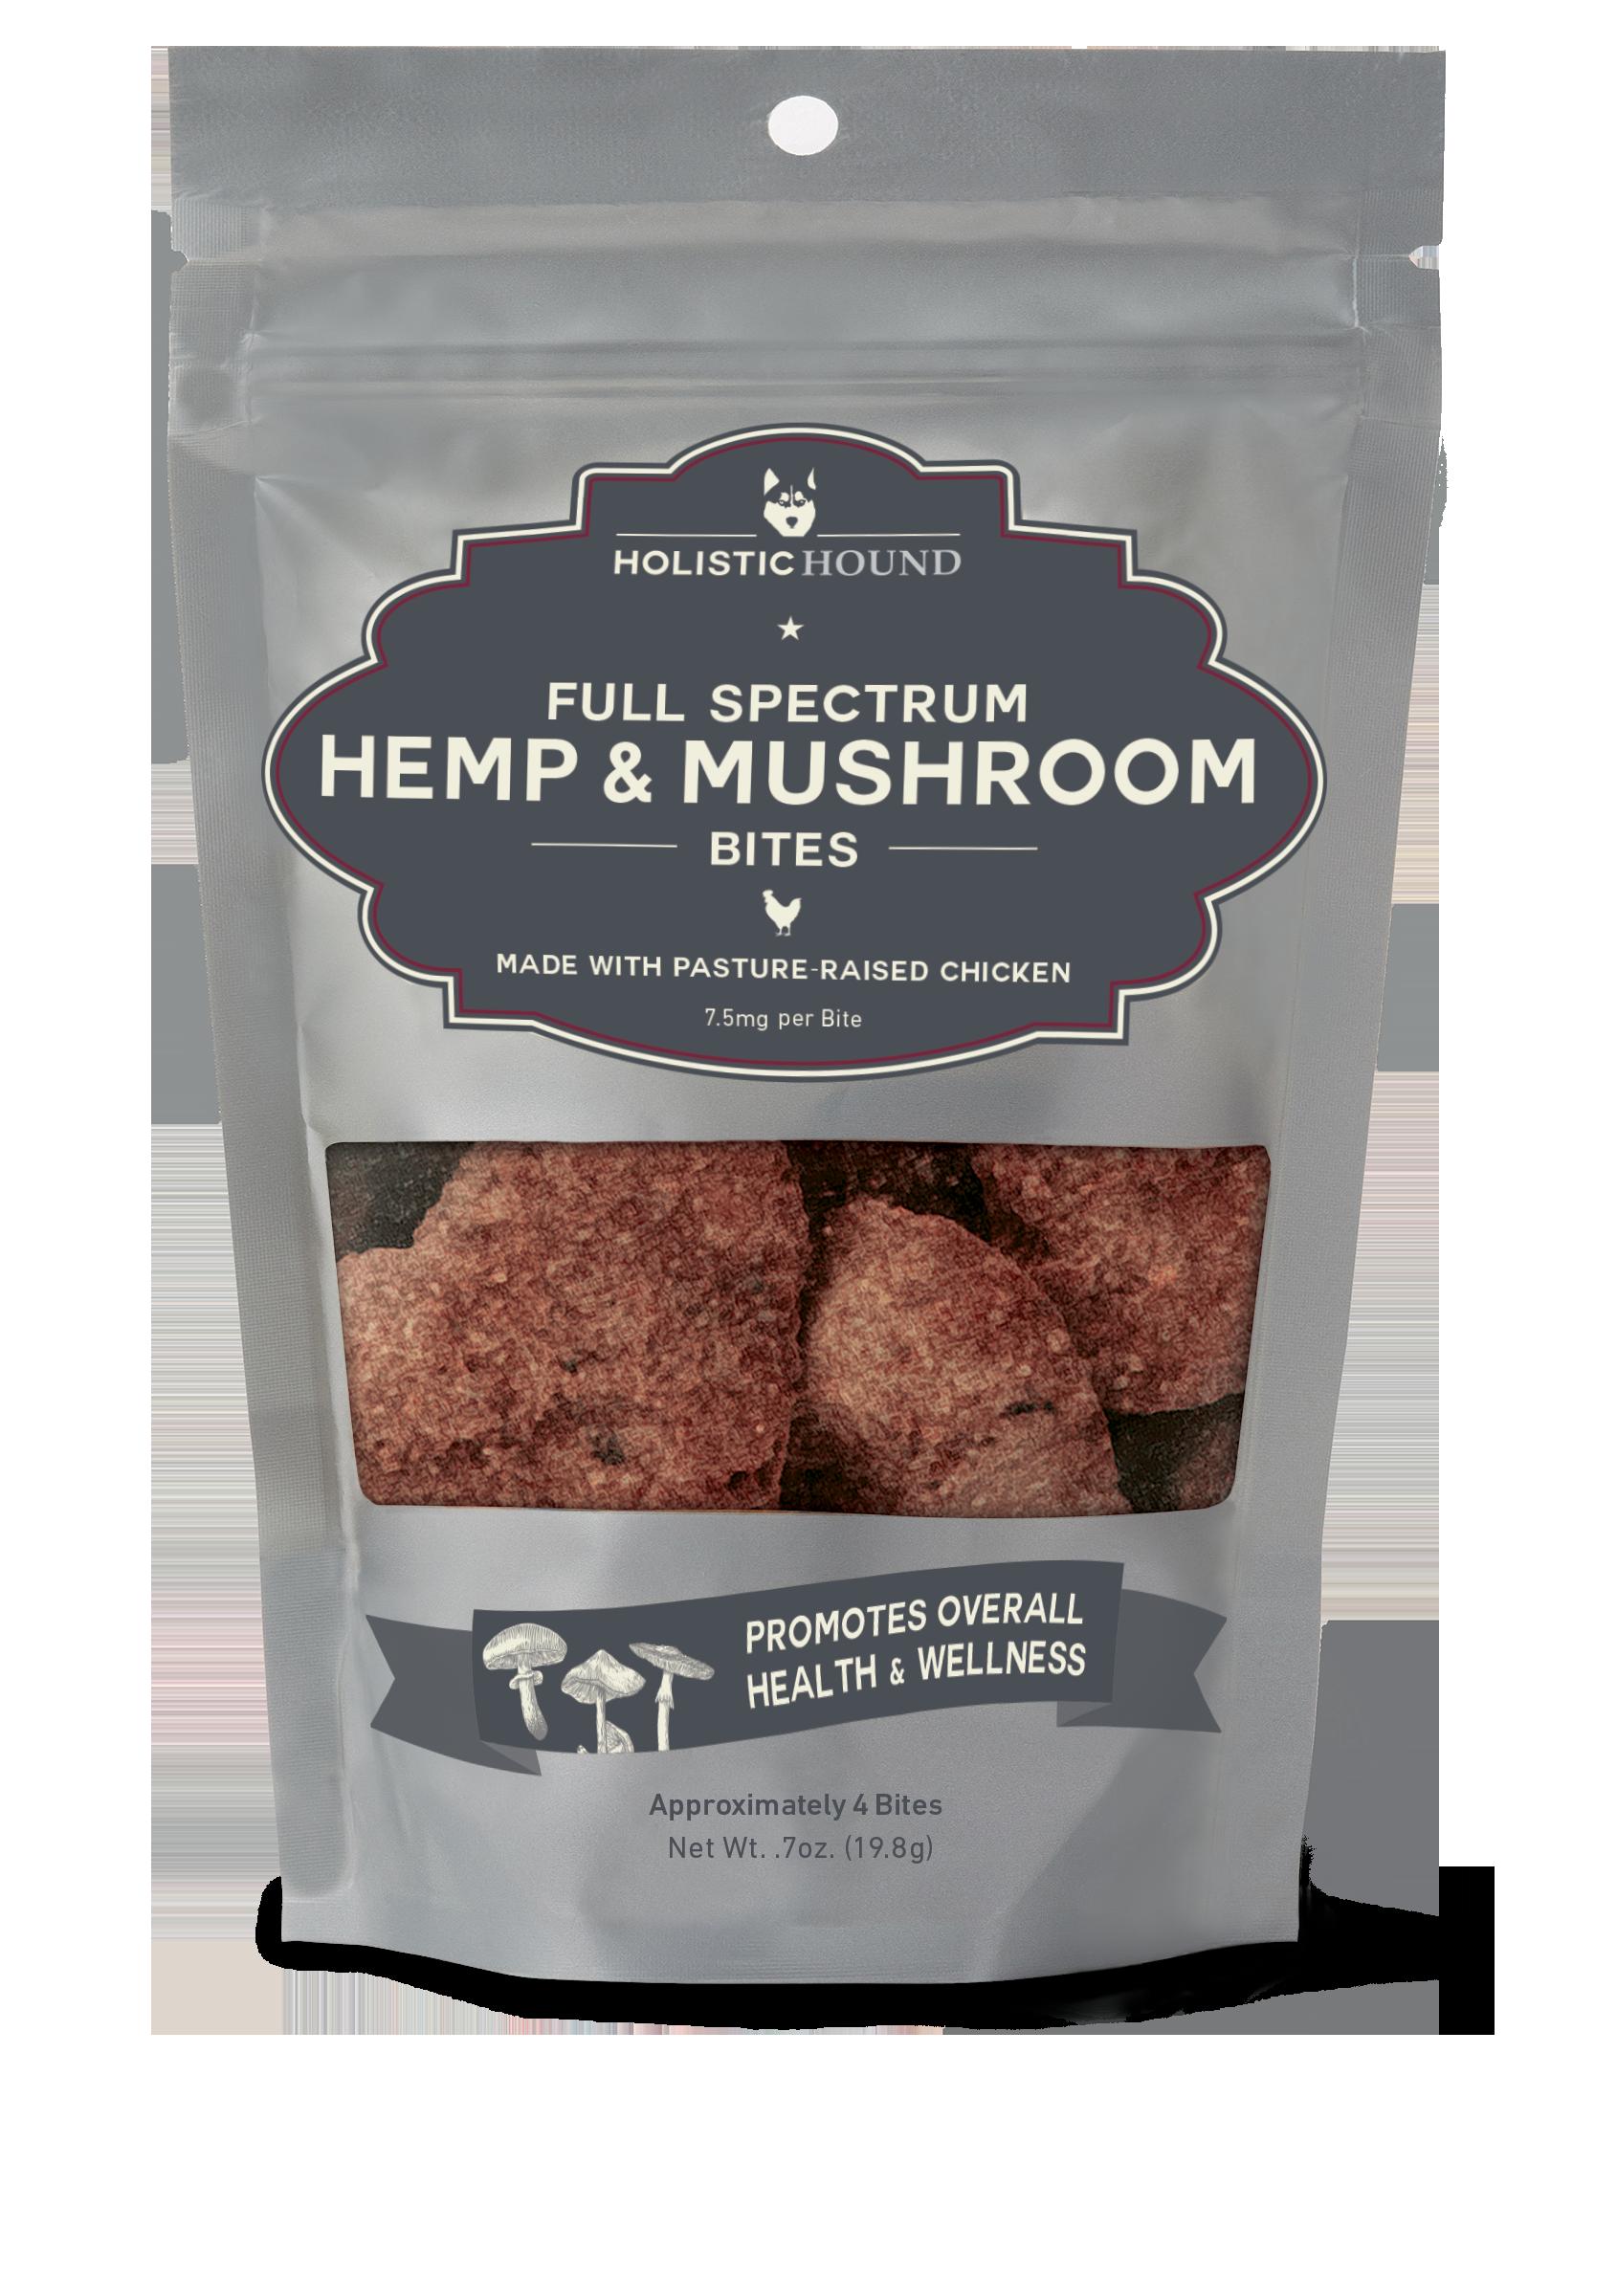 Holistic Hound Chicken & Mushroom Bites for Dogs, 7.5-mg, 0.7-oz